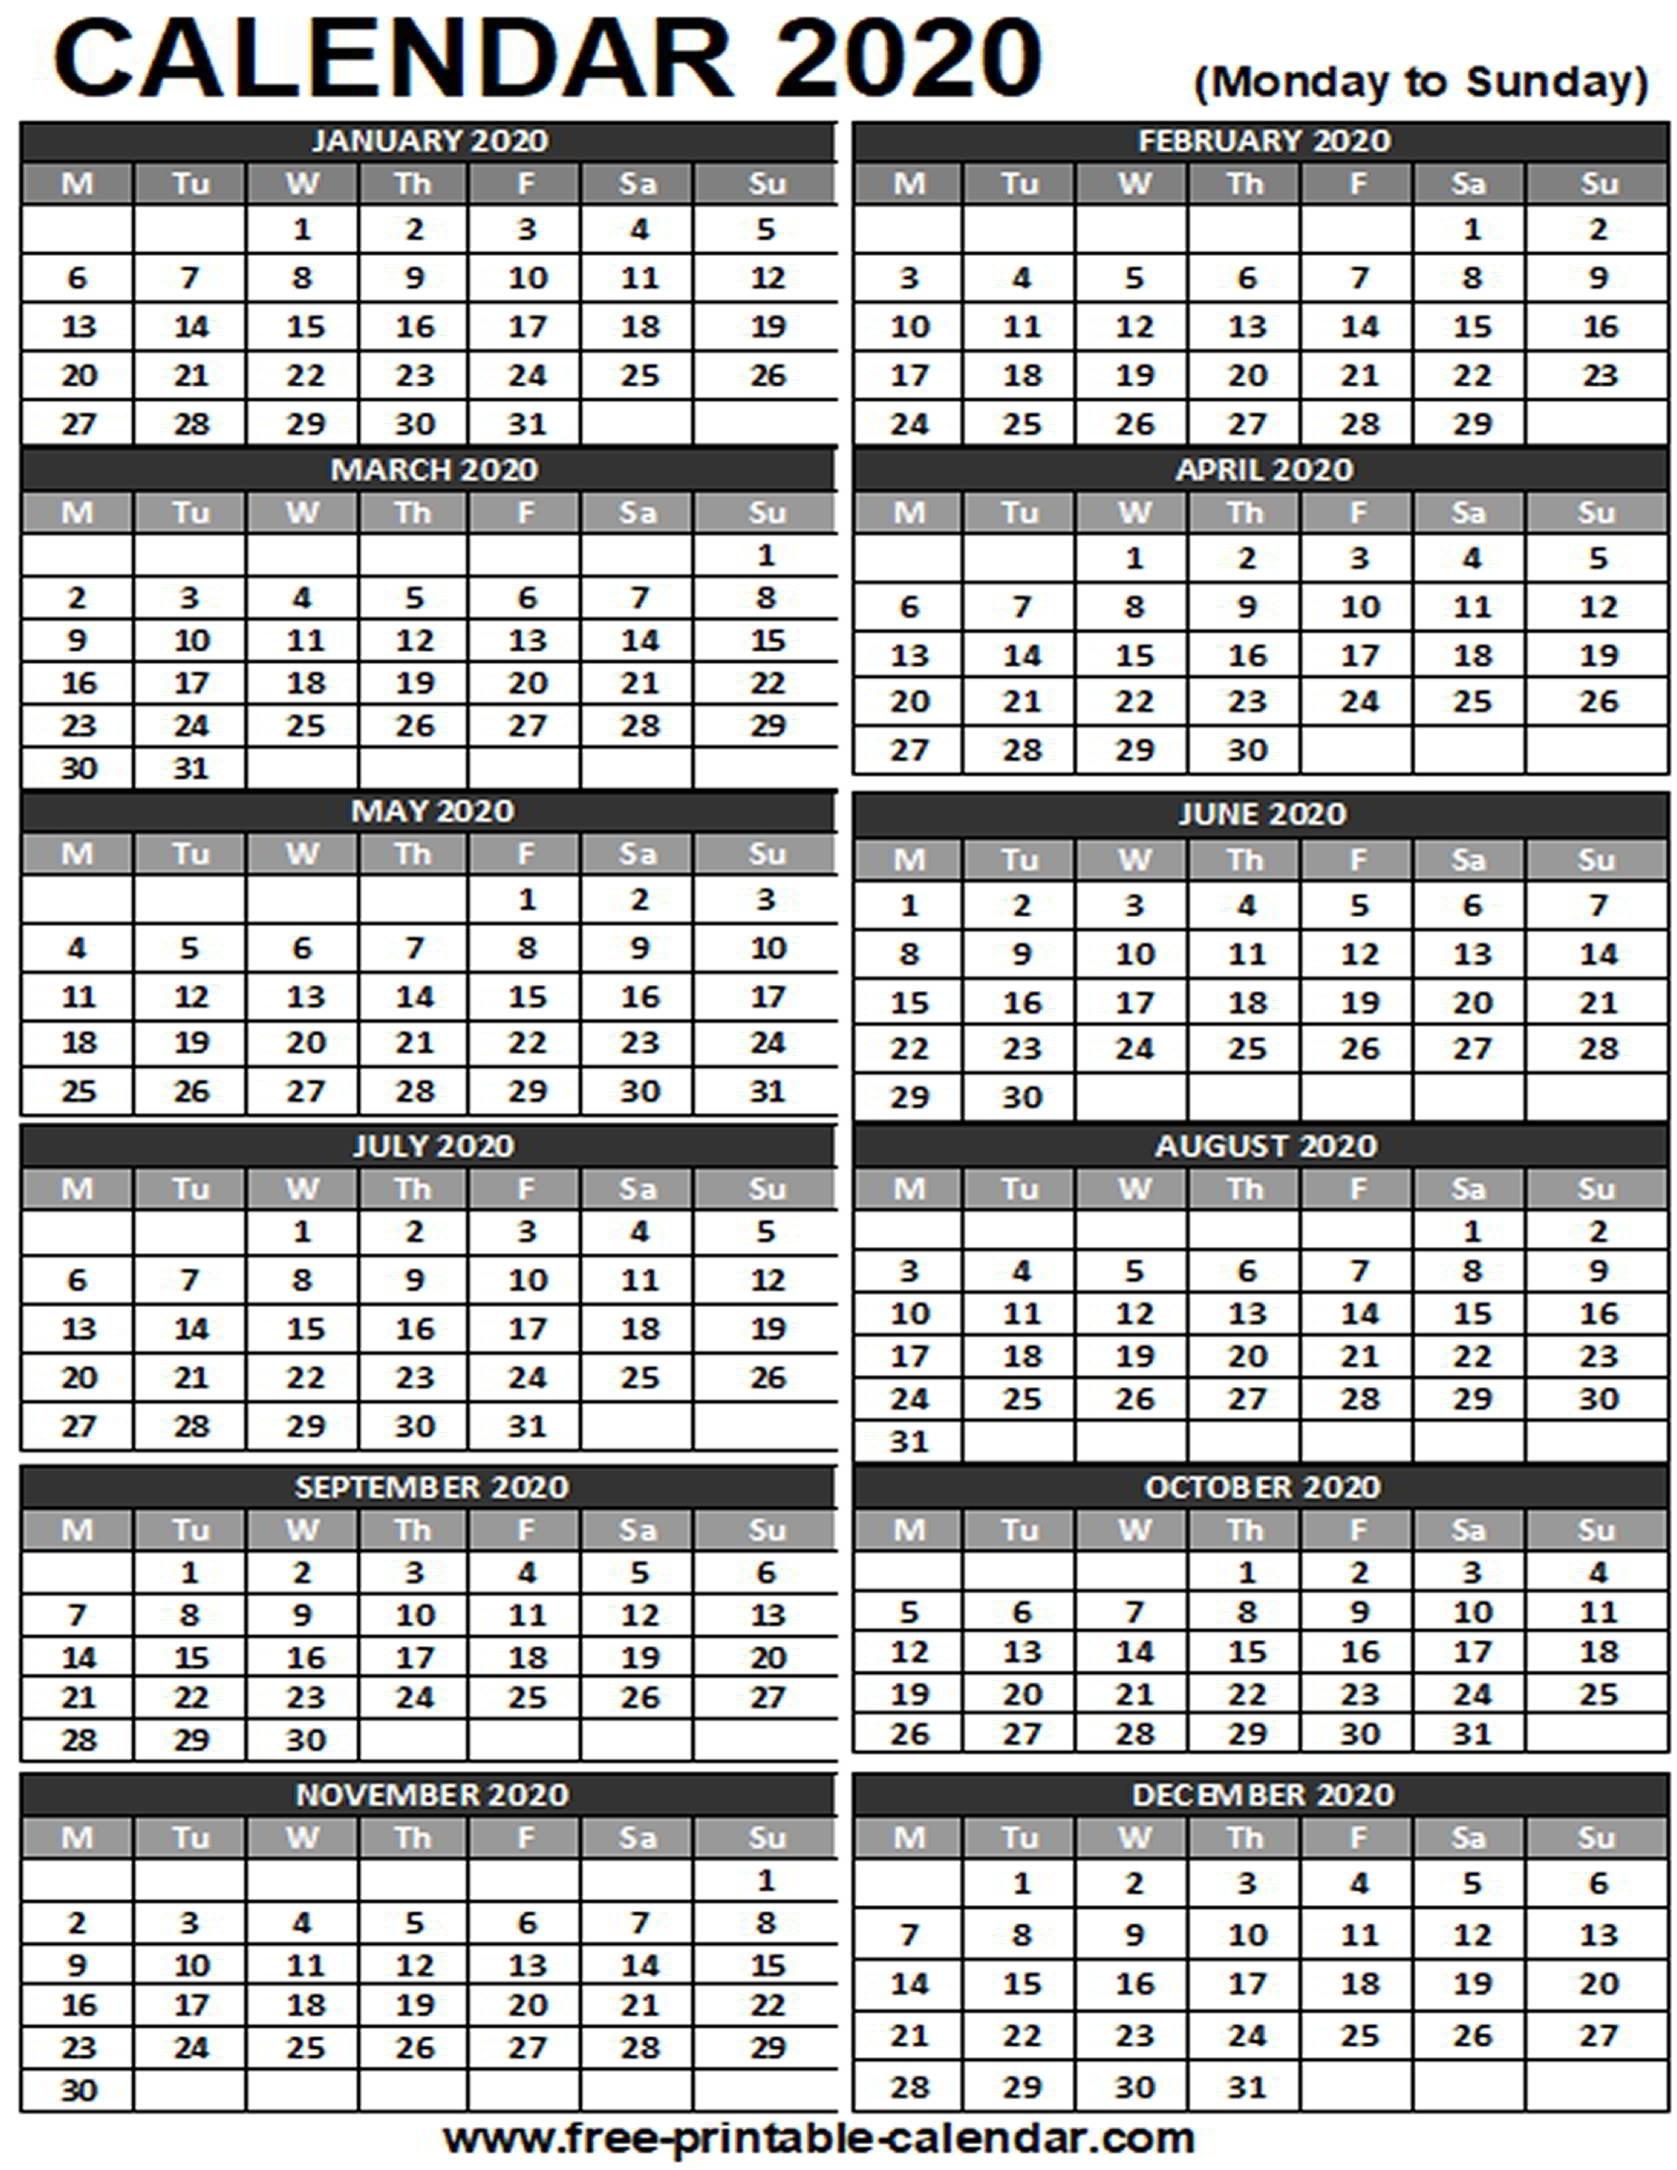 2020 Printable Calendar - Free-Printable-Calendar